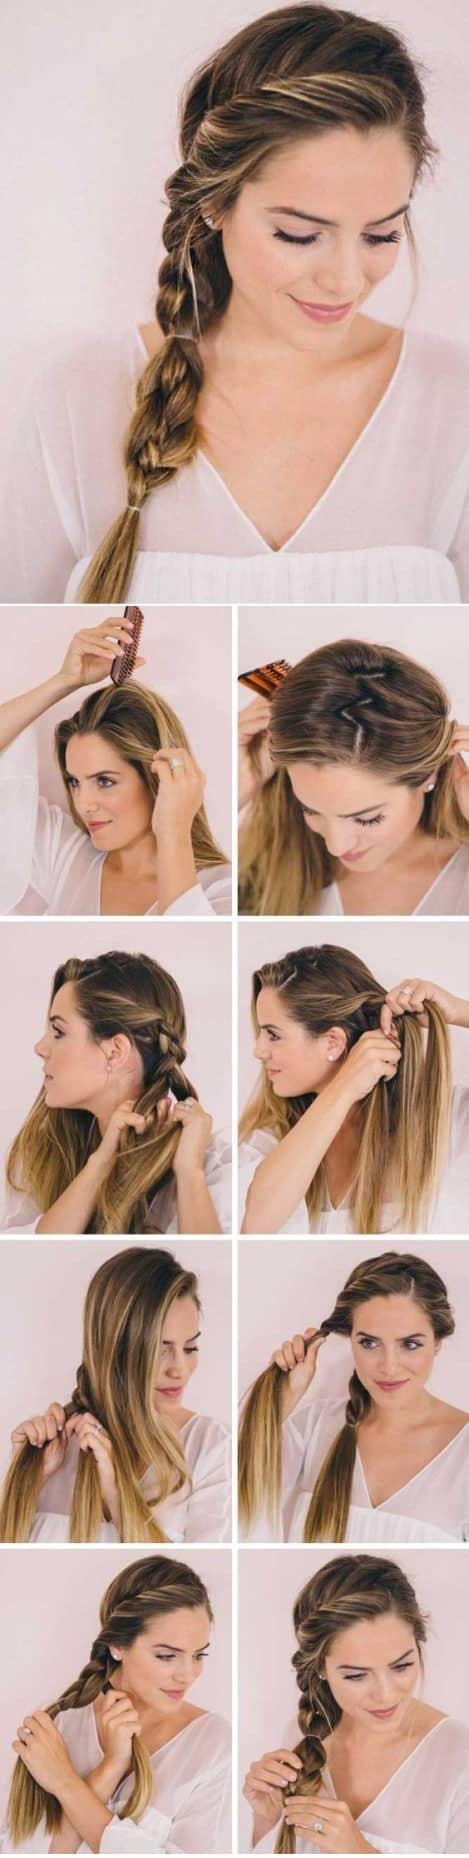 trenzas faciles para pelo largo